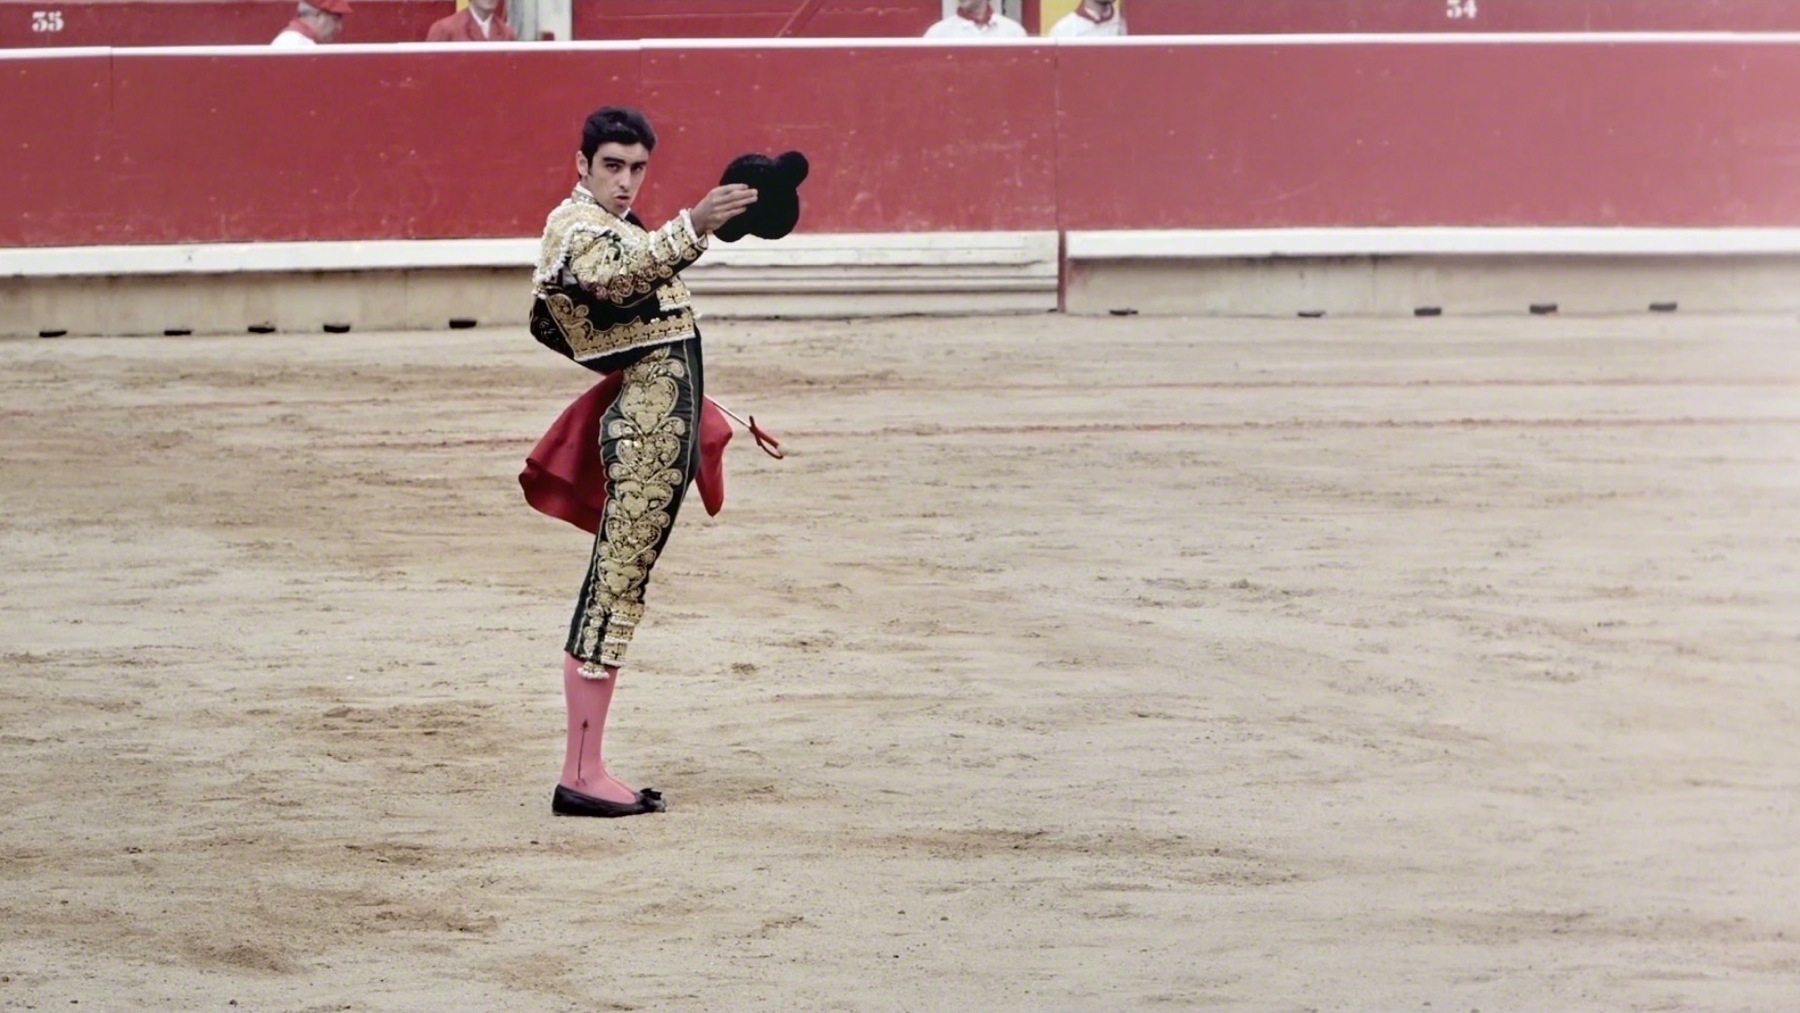 Matador in pamplona bullfights